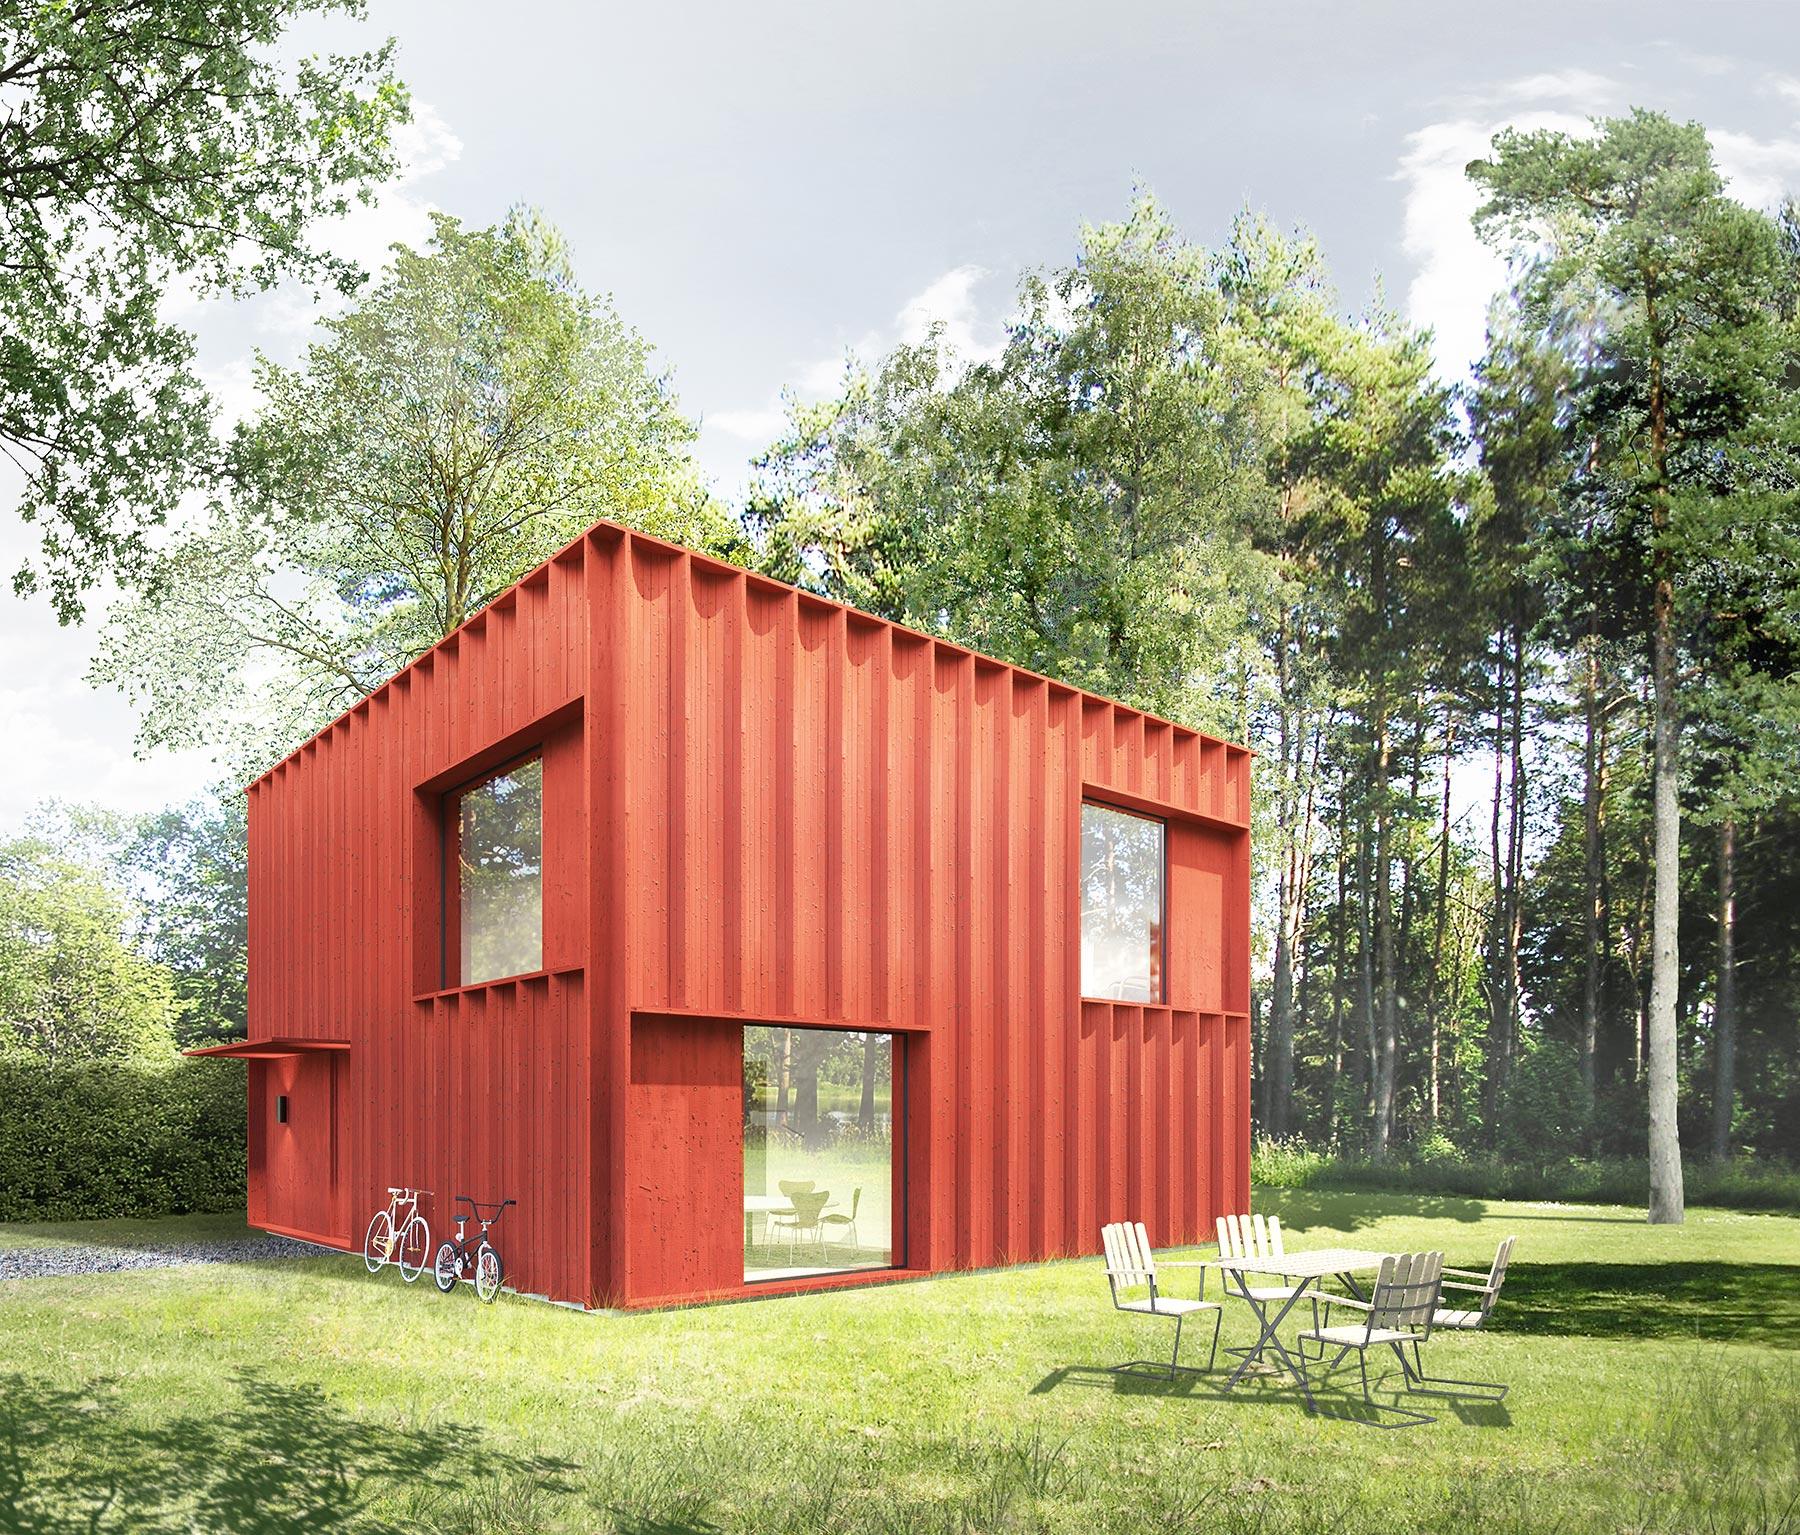 Planos de casa cuadrada peque a y moderna construye hogar for Diseno de frente de casa pequena